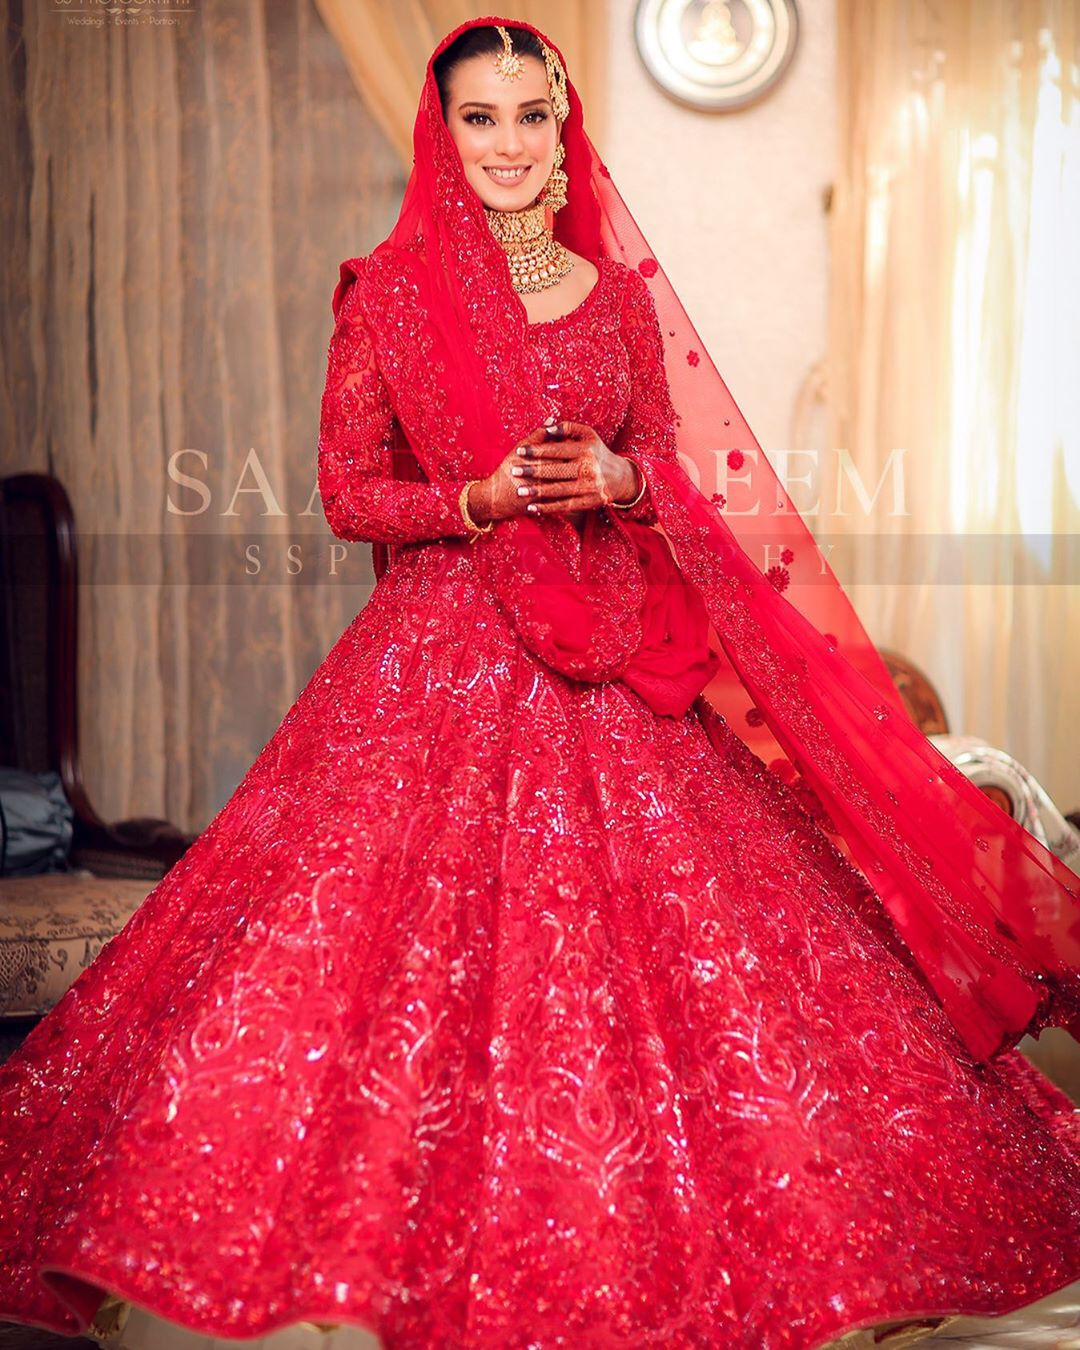 Iqra Aziz and Yasir Hussain Wedding Pictures (15)